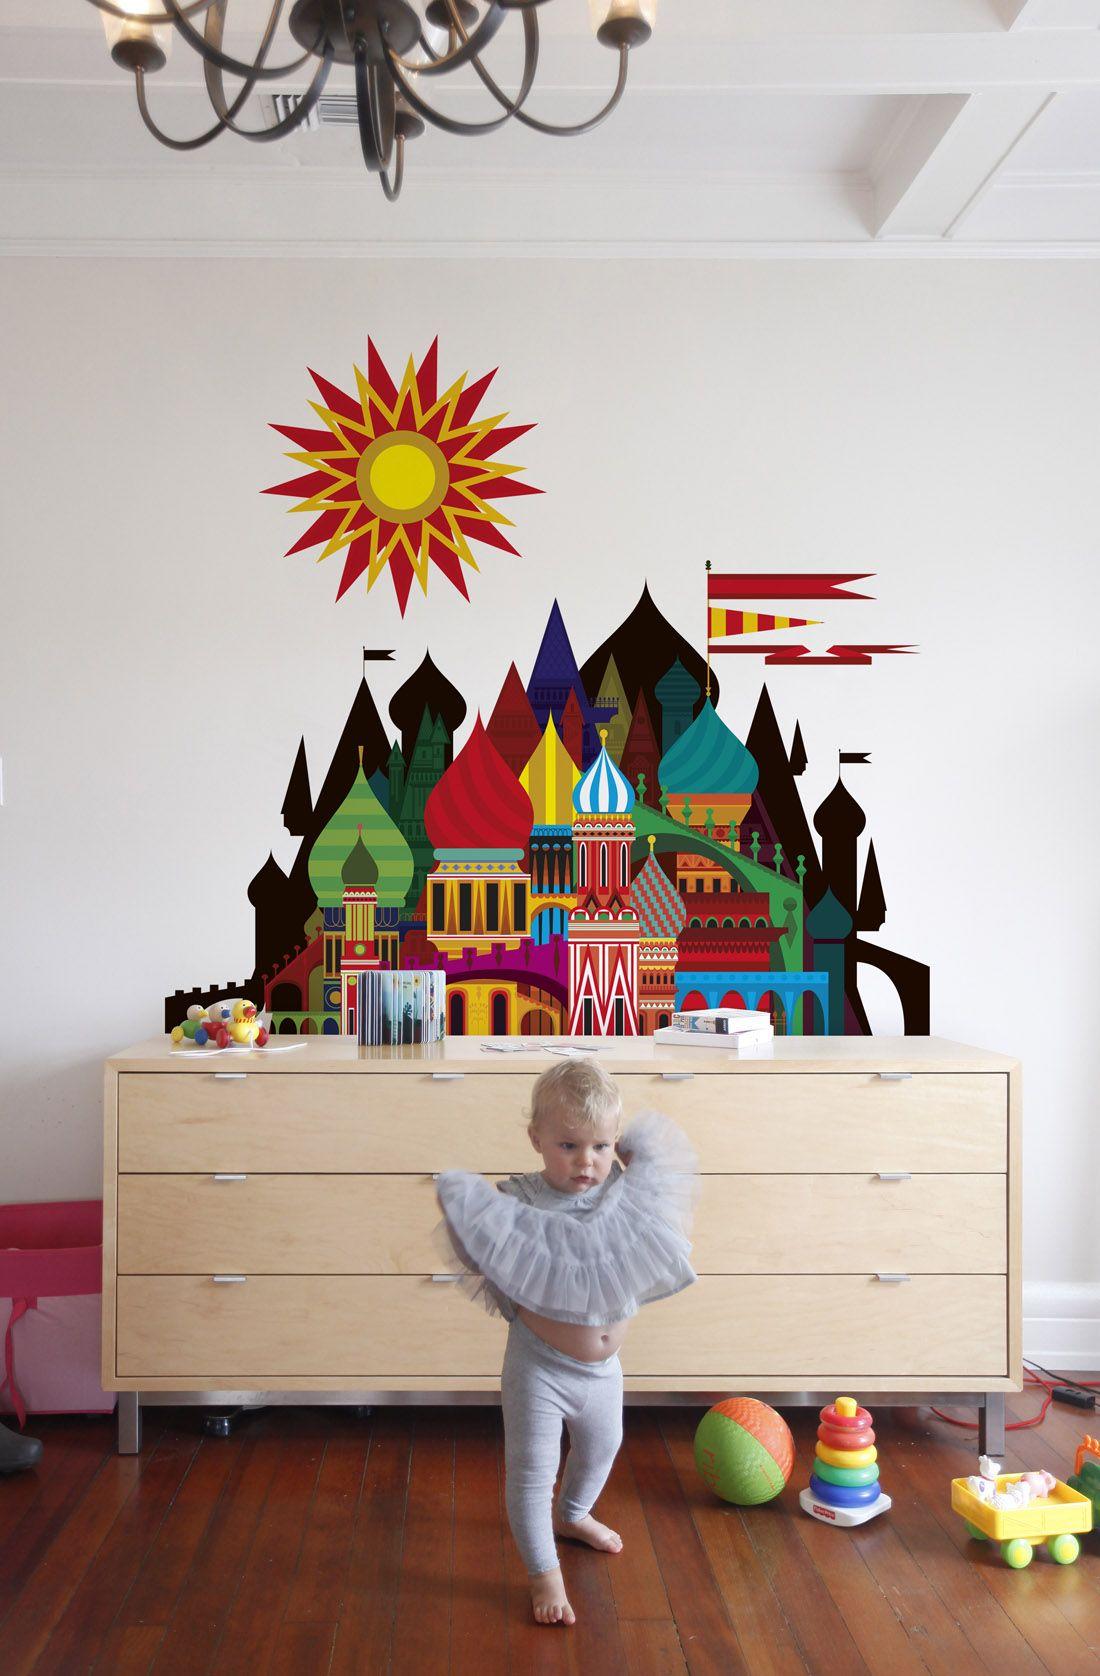 imaginary castle small wall decals blik wall graphics radio wall sticker wallpaper fabrics tiles graphic